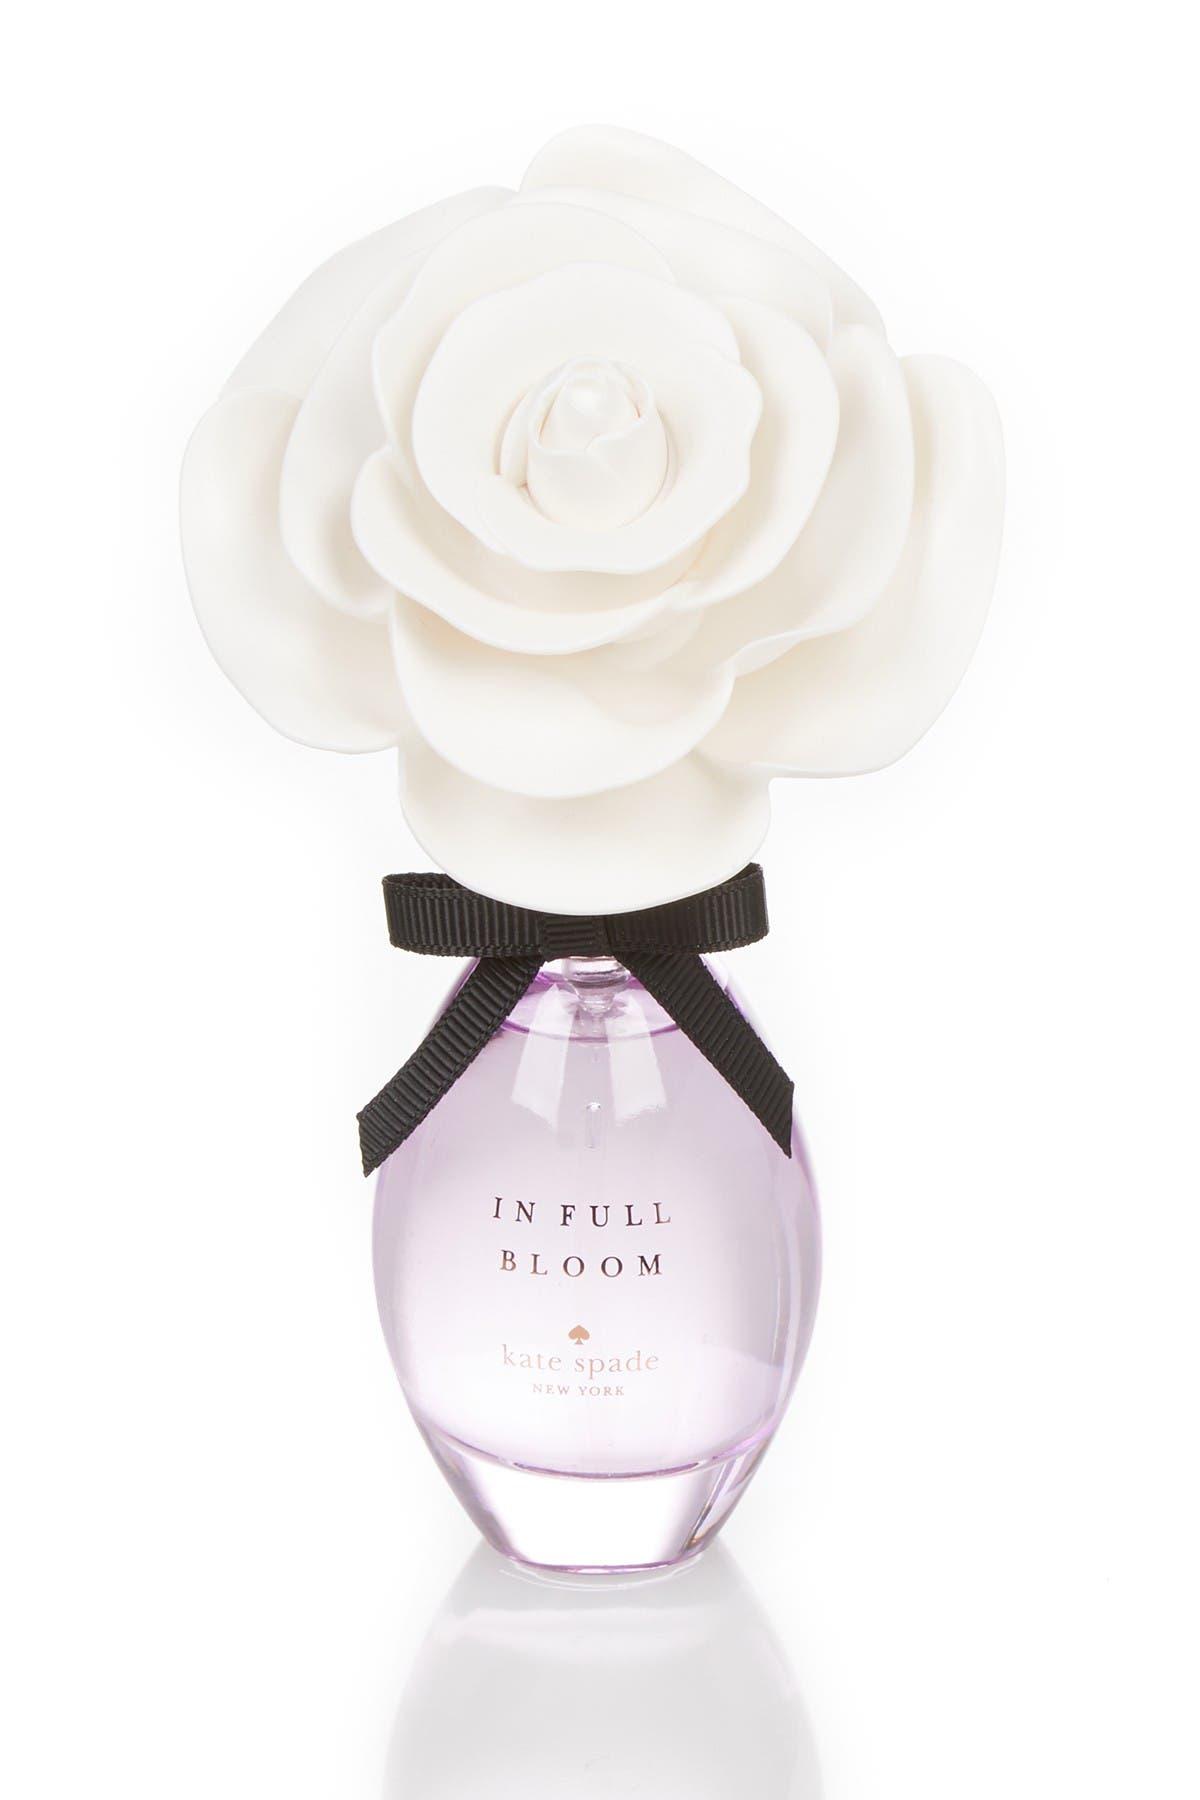 Image of kate spade new york in full bloom 1 oz. eau de parfume